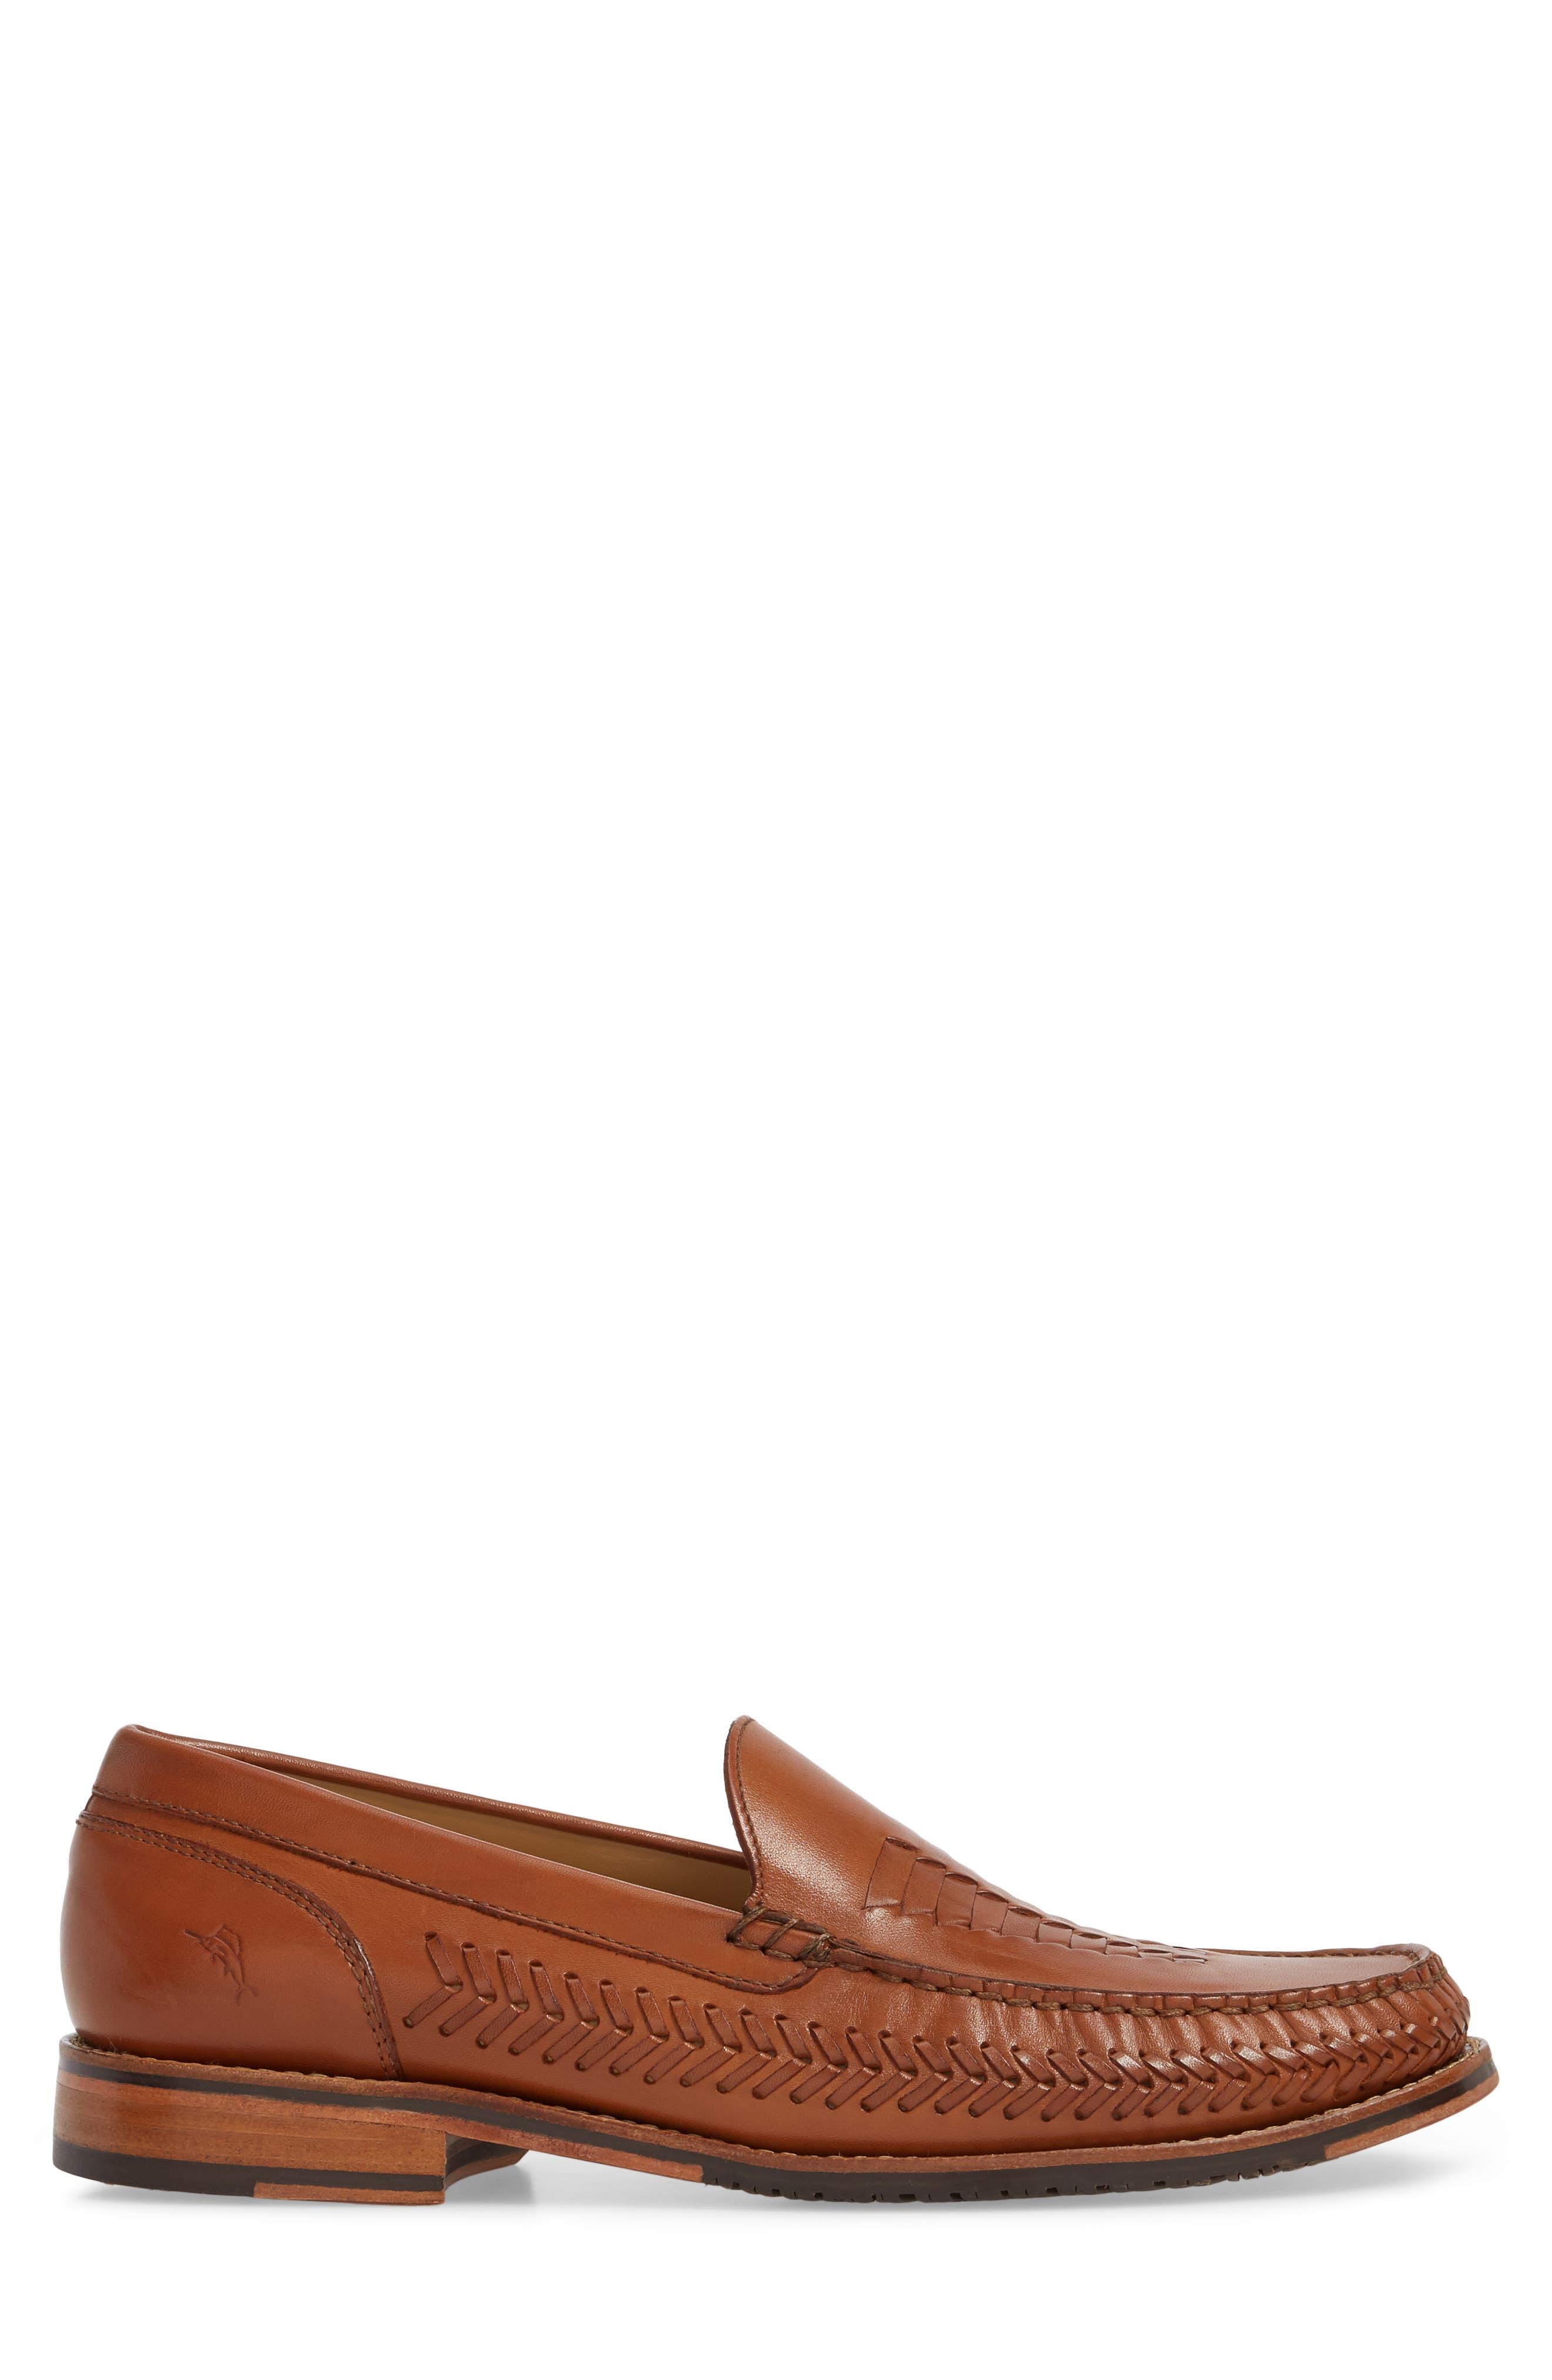 Hasslington Woven Venetian Loafer,                             Alternate thumbnail 3, color,                             Tan Leather